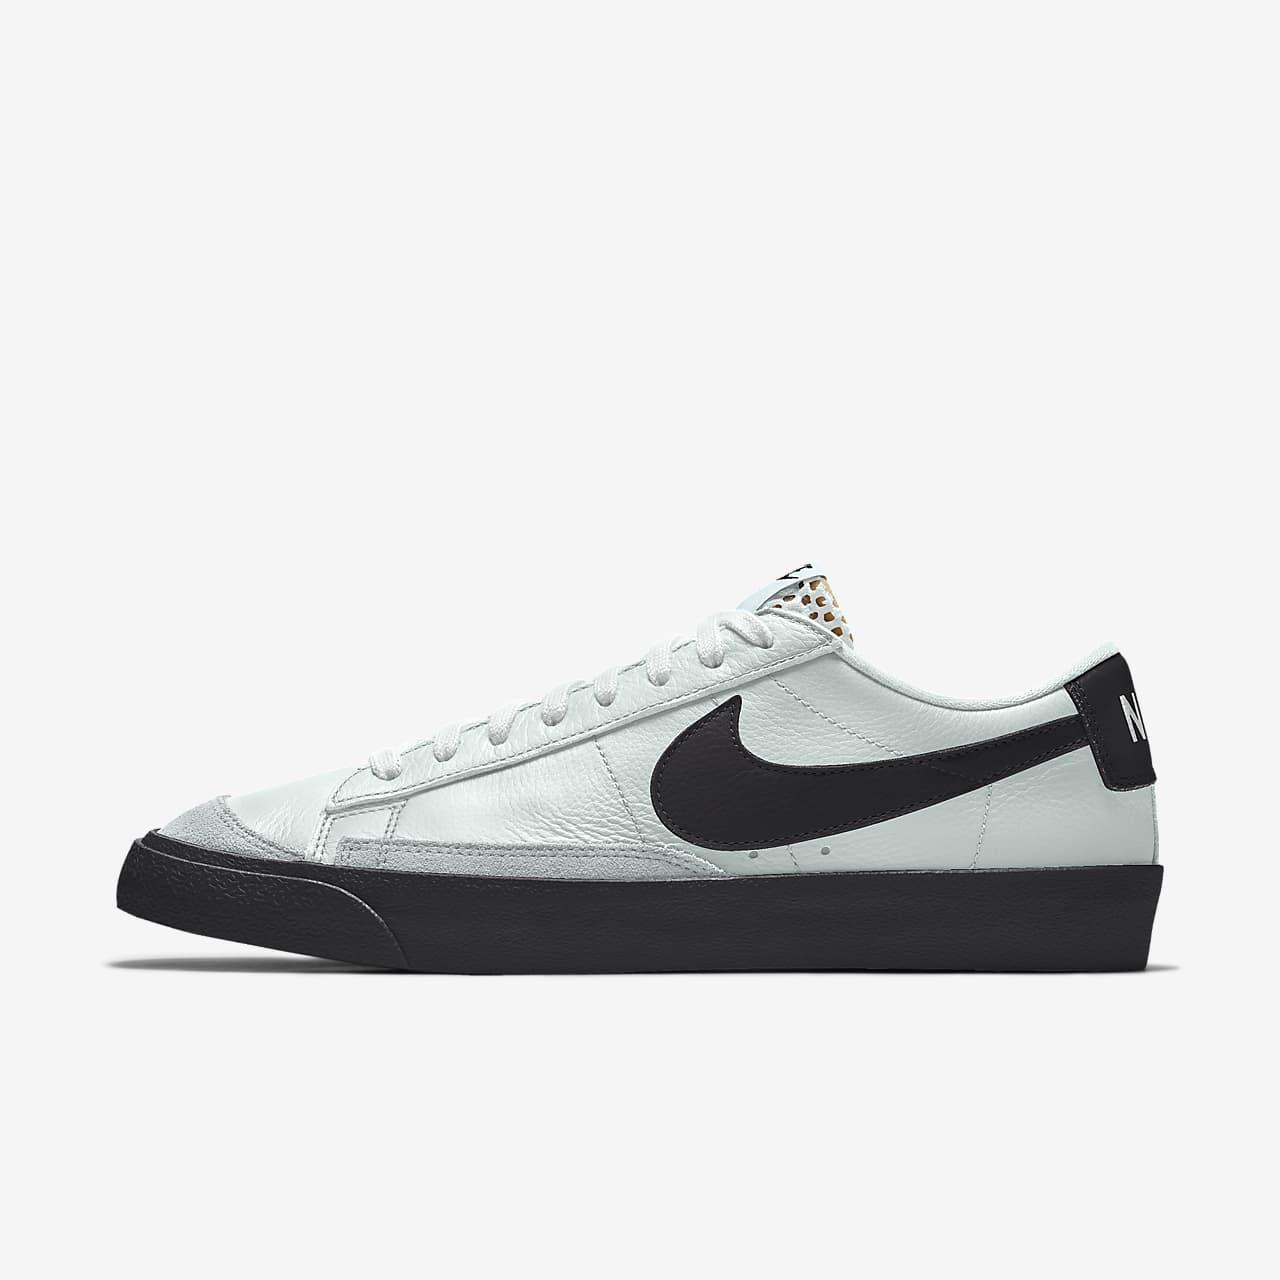 Nike Blazer 低筒 '77 Vintage By You 專屬訂製鞋款